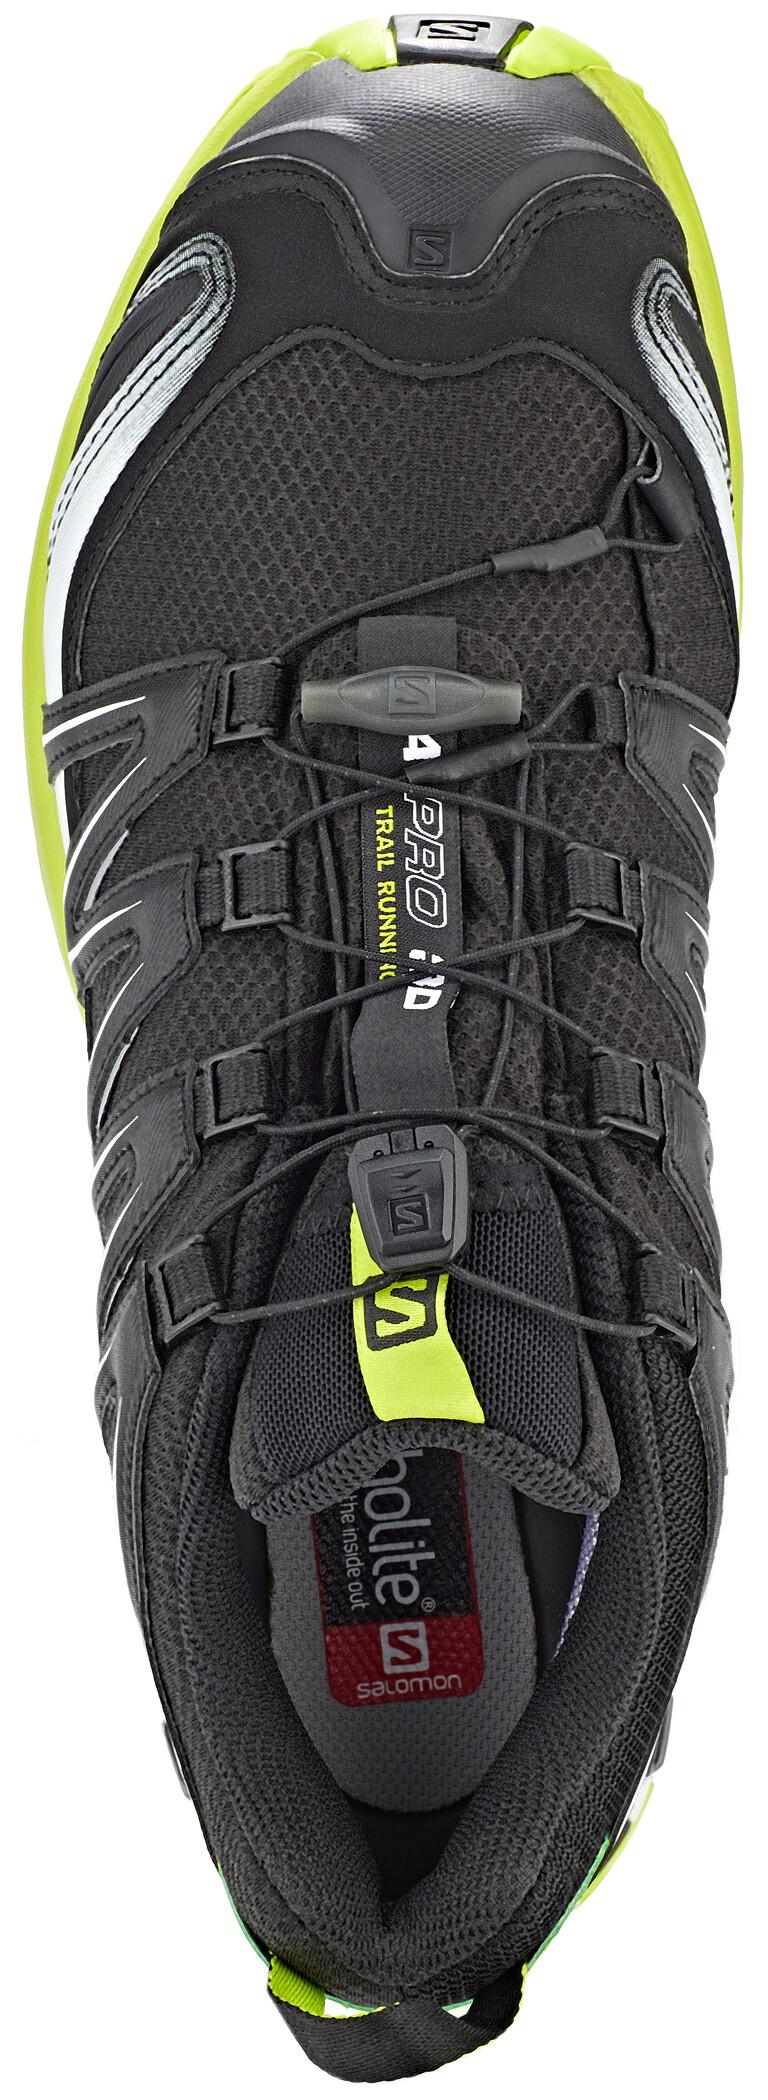 Salomon XA Pro 3D GTX Trailrunning Schuhe Herren blacklime greenwhite